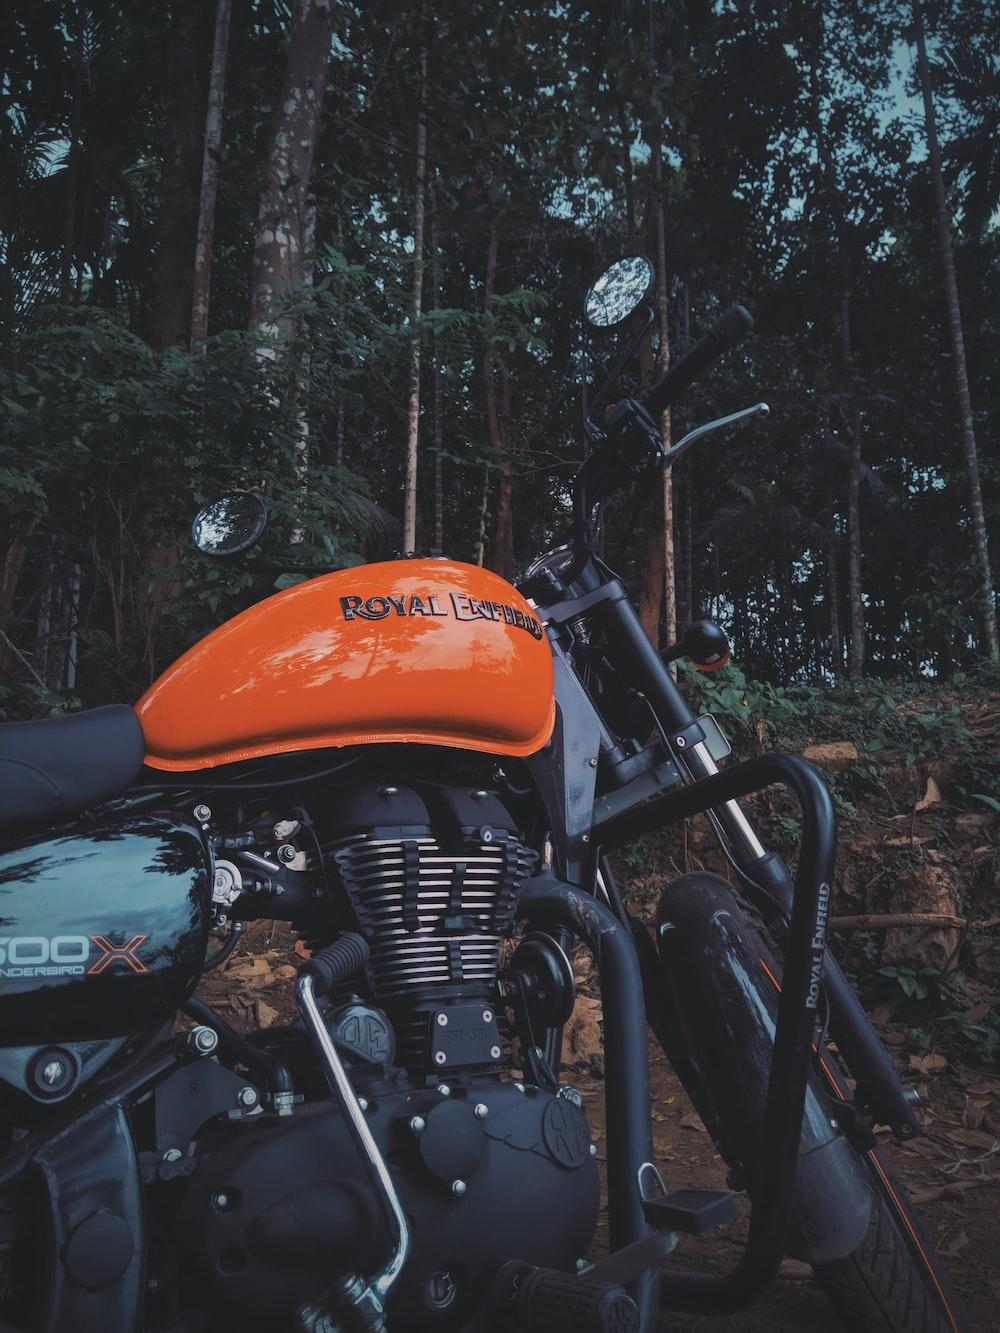 black and orange Royal Enfield motorcycle during daytime